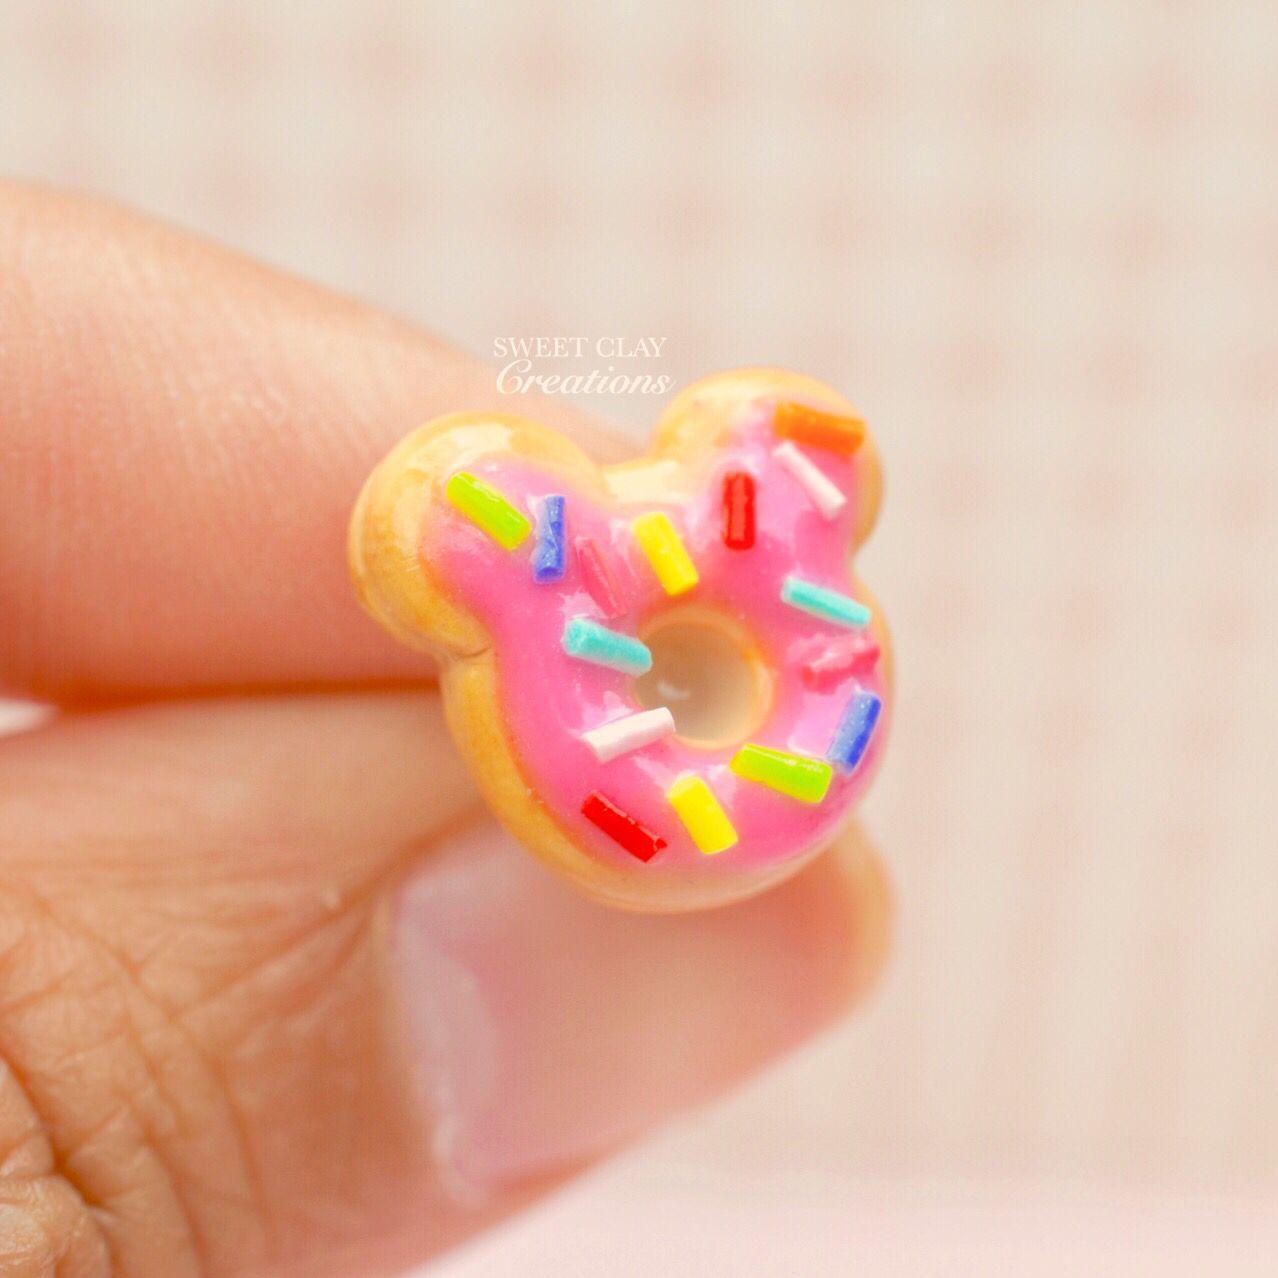 Minnie Pink Donut Ears Post Stud Earrings Polymer Clay Miniature Food Jewelry Handmade by Sweet Clay Creations